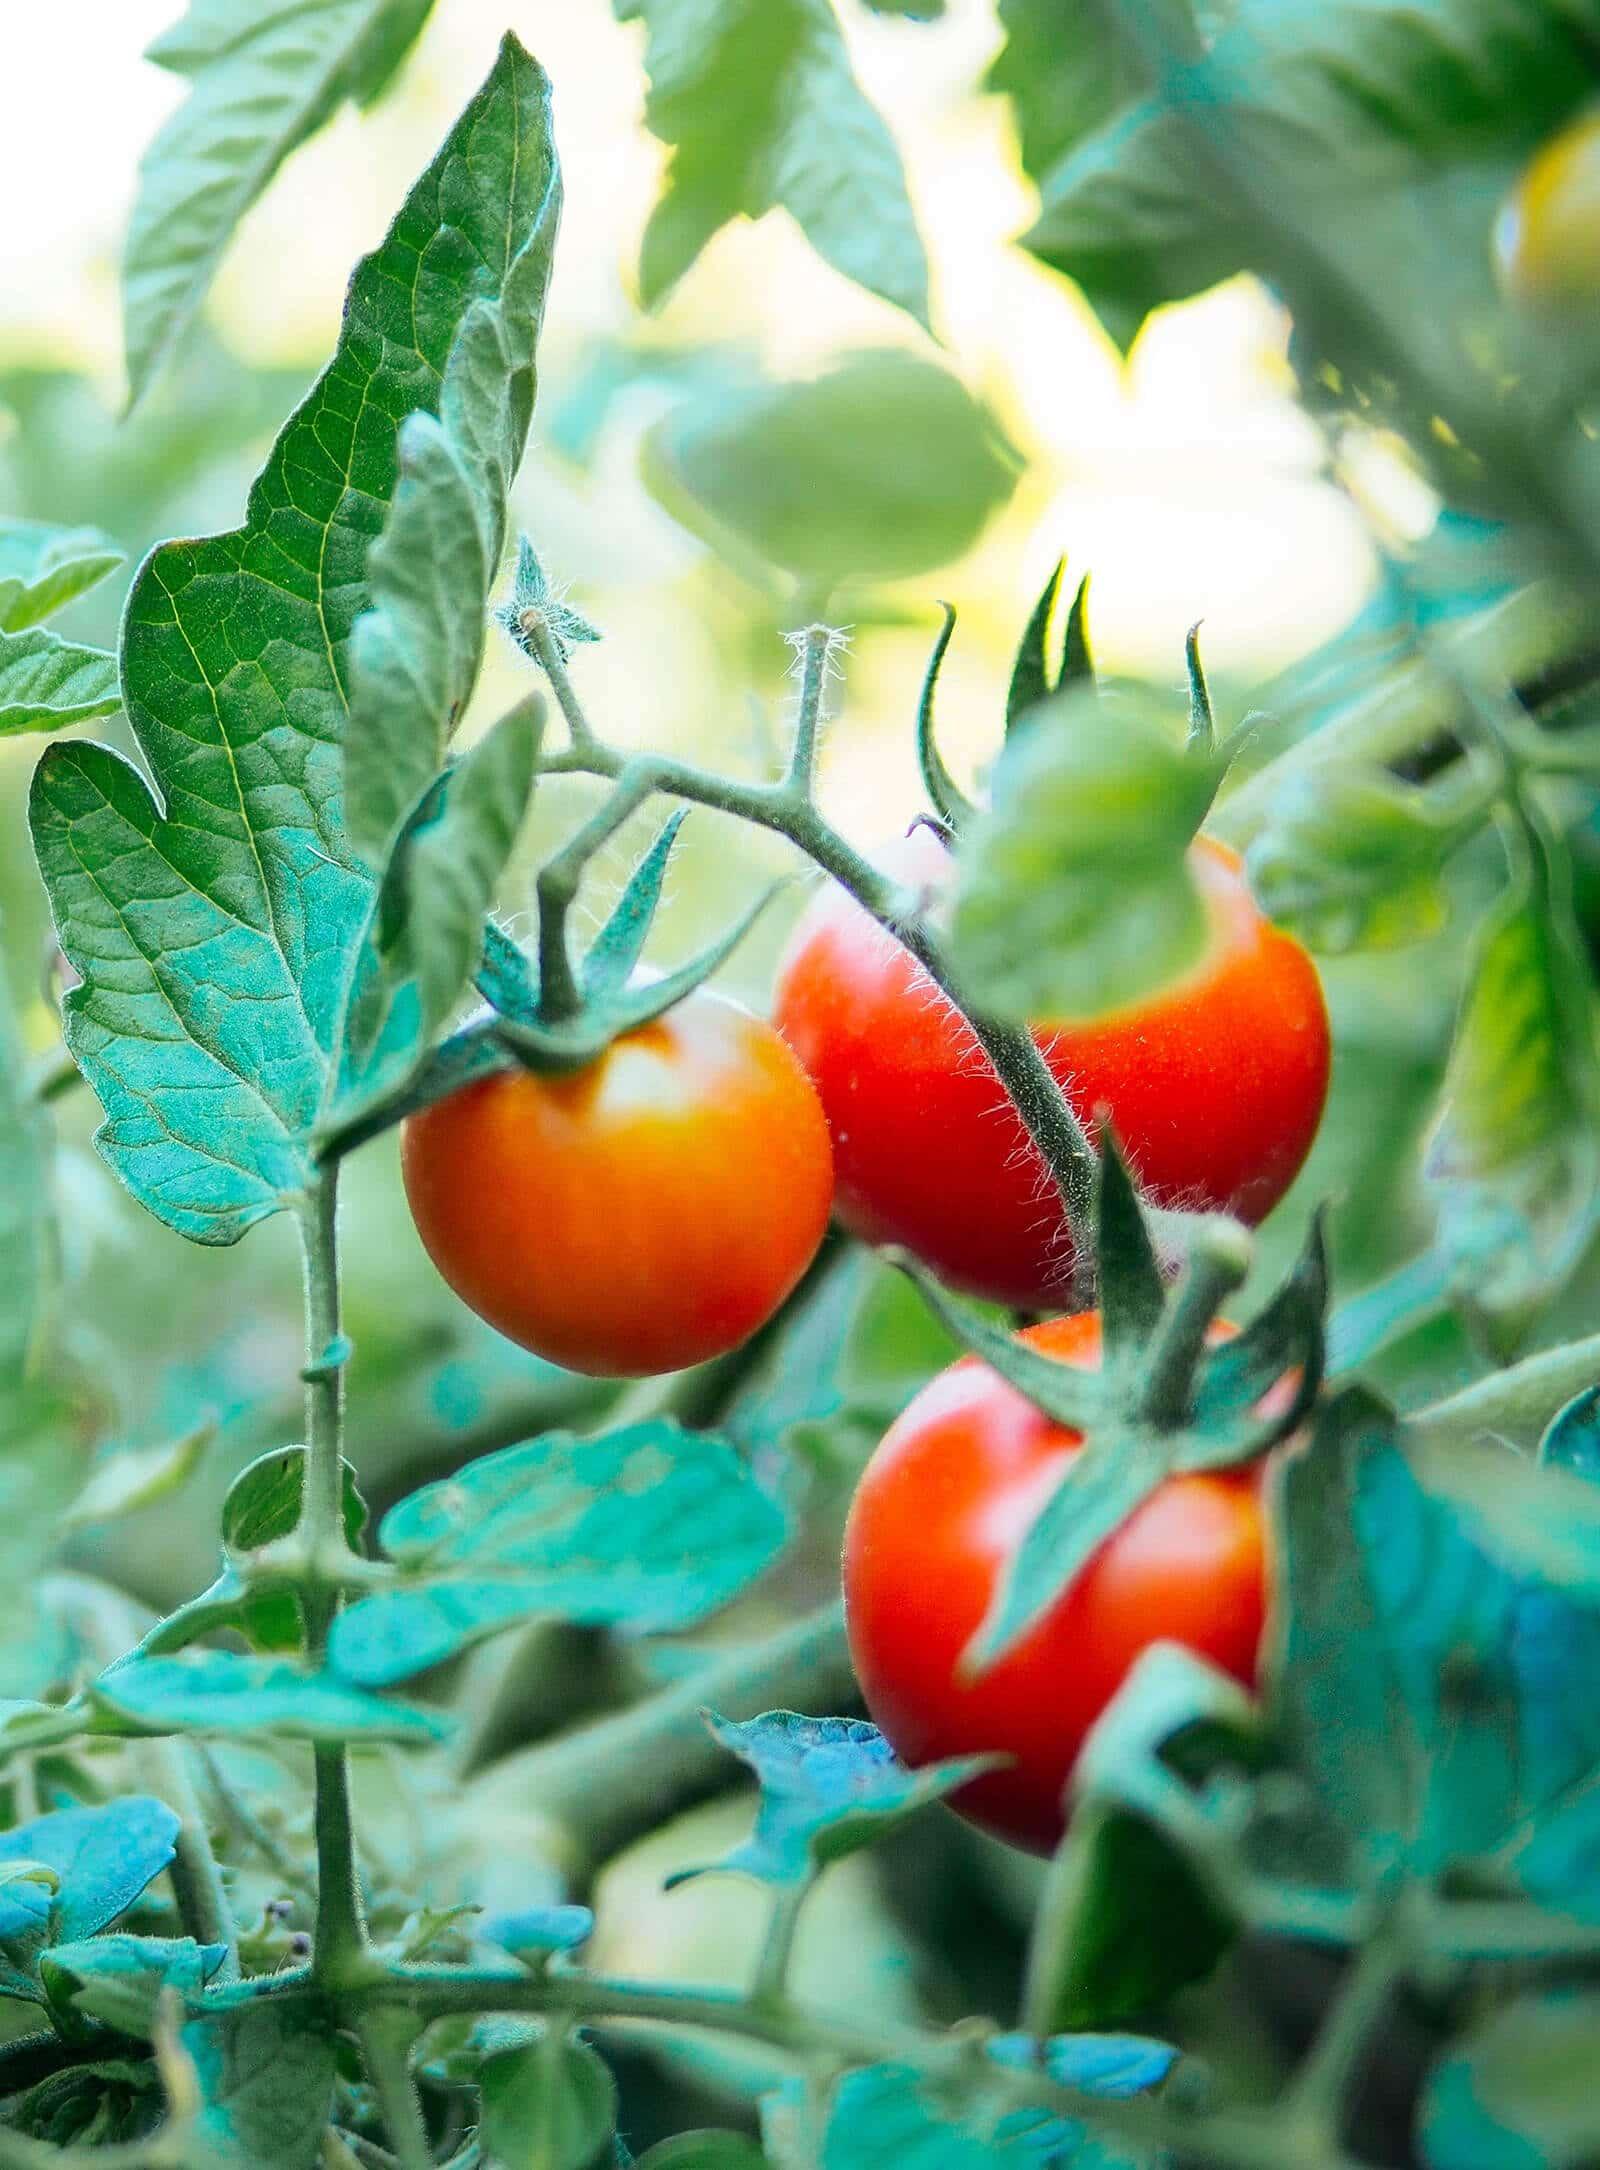 Ripe tomatoes on the vine